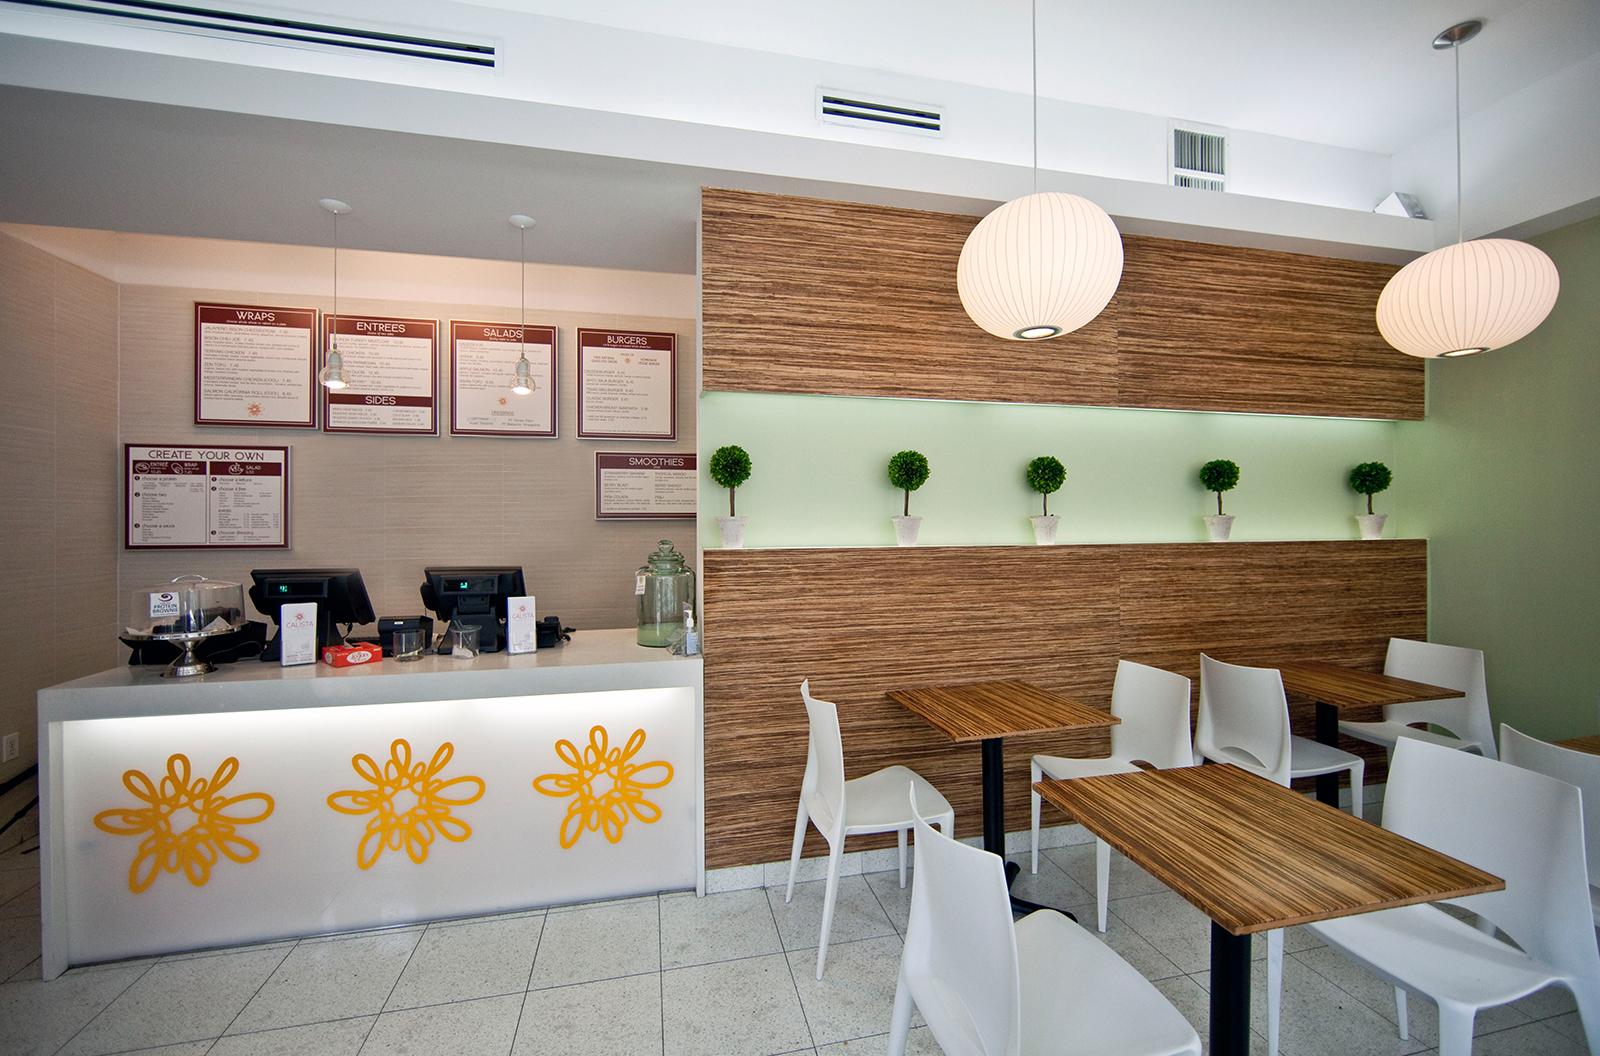 Calista Mandarina Studio NYC Healthy Food restaurant Design_4.jpg